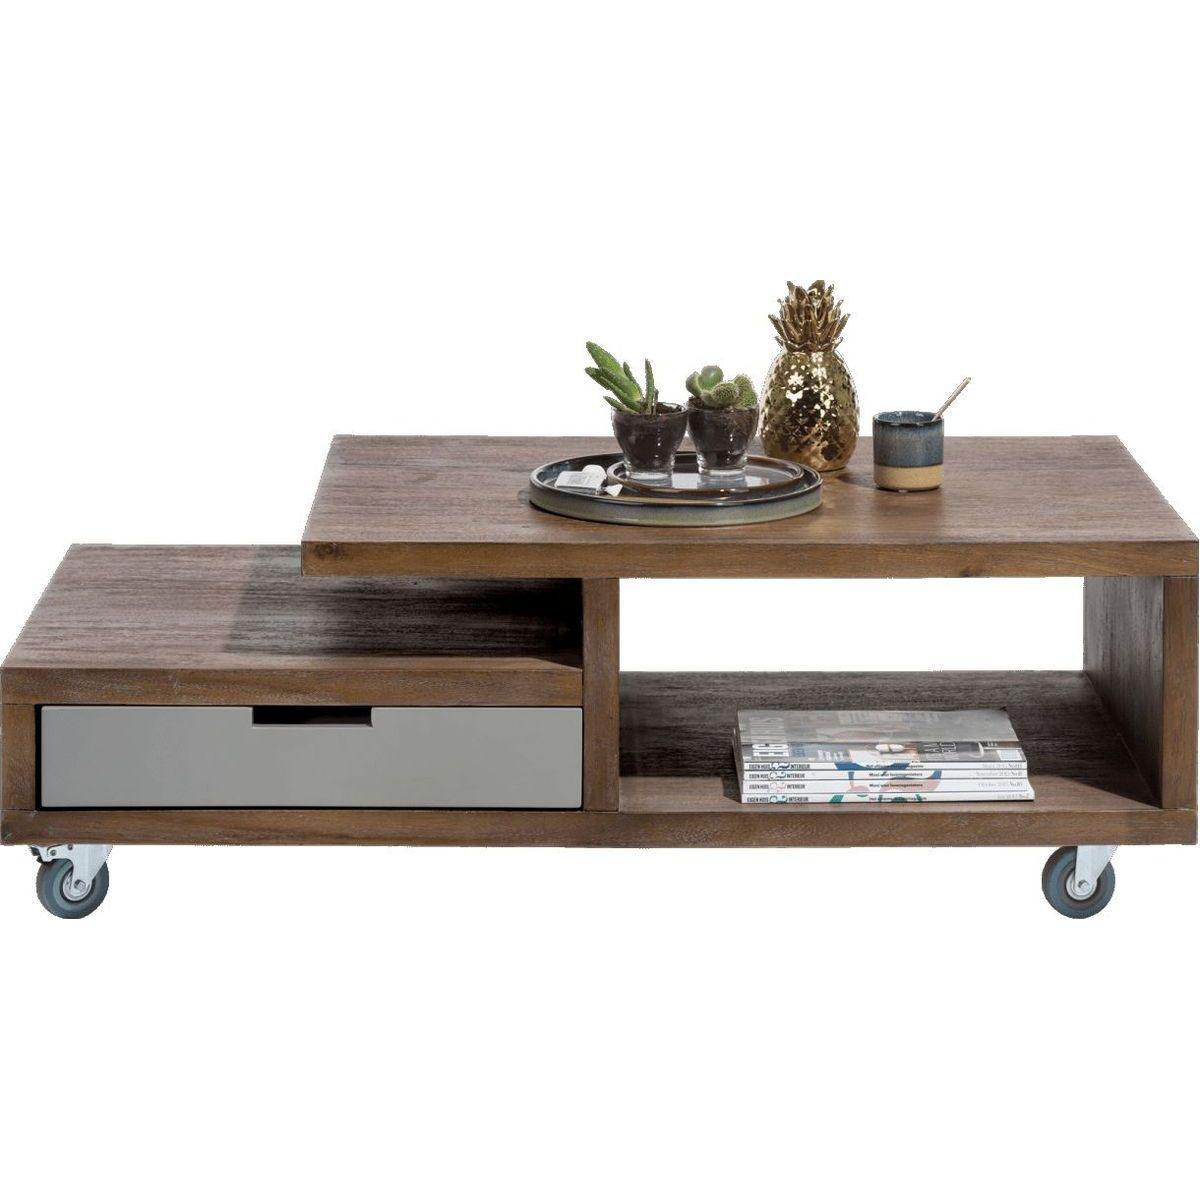 Table basse BOX Henders & Hazel 60x120cm Tramwood Walnut gris